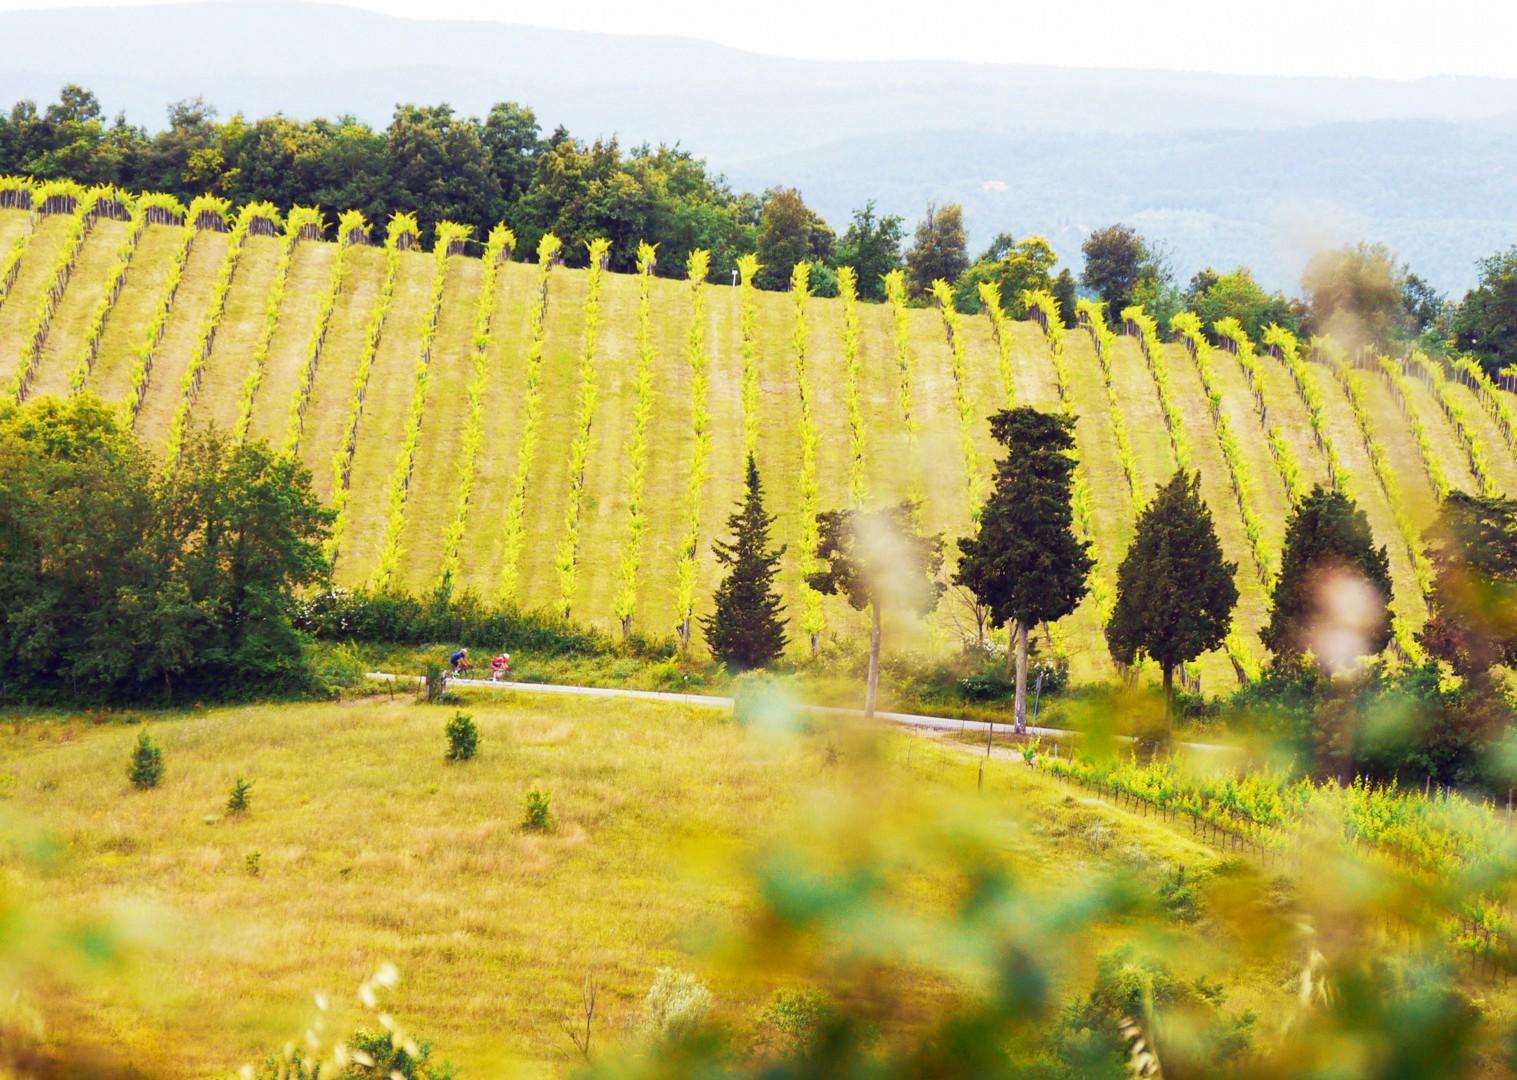 vineyards-road-cycling-italy-tuscany.jpg - Italy - Tuscany Tourer - Self Guided Road Cycling Holiday - Italia Road Cycling